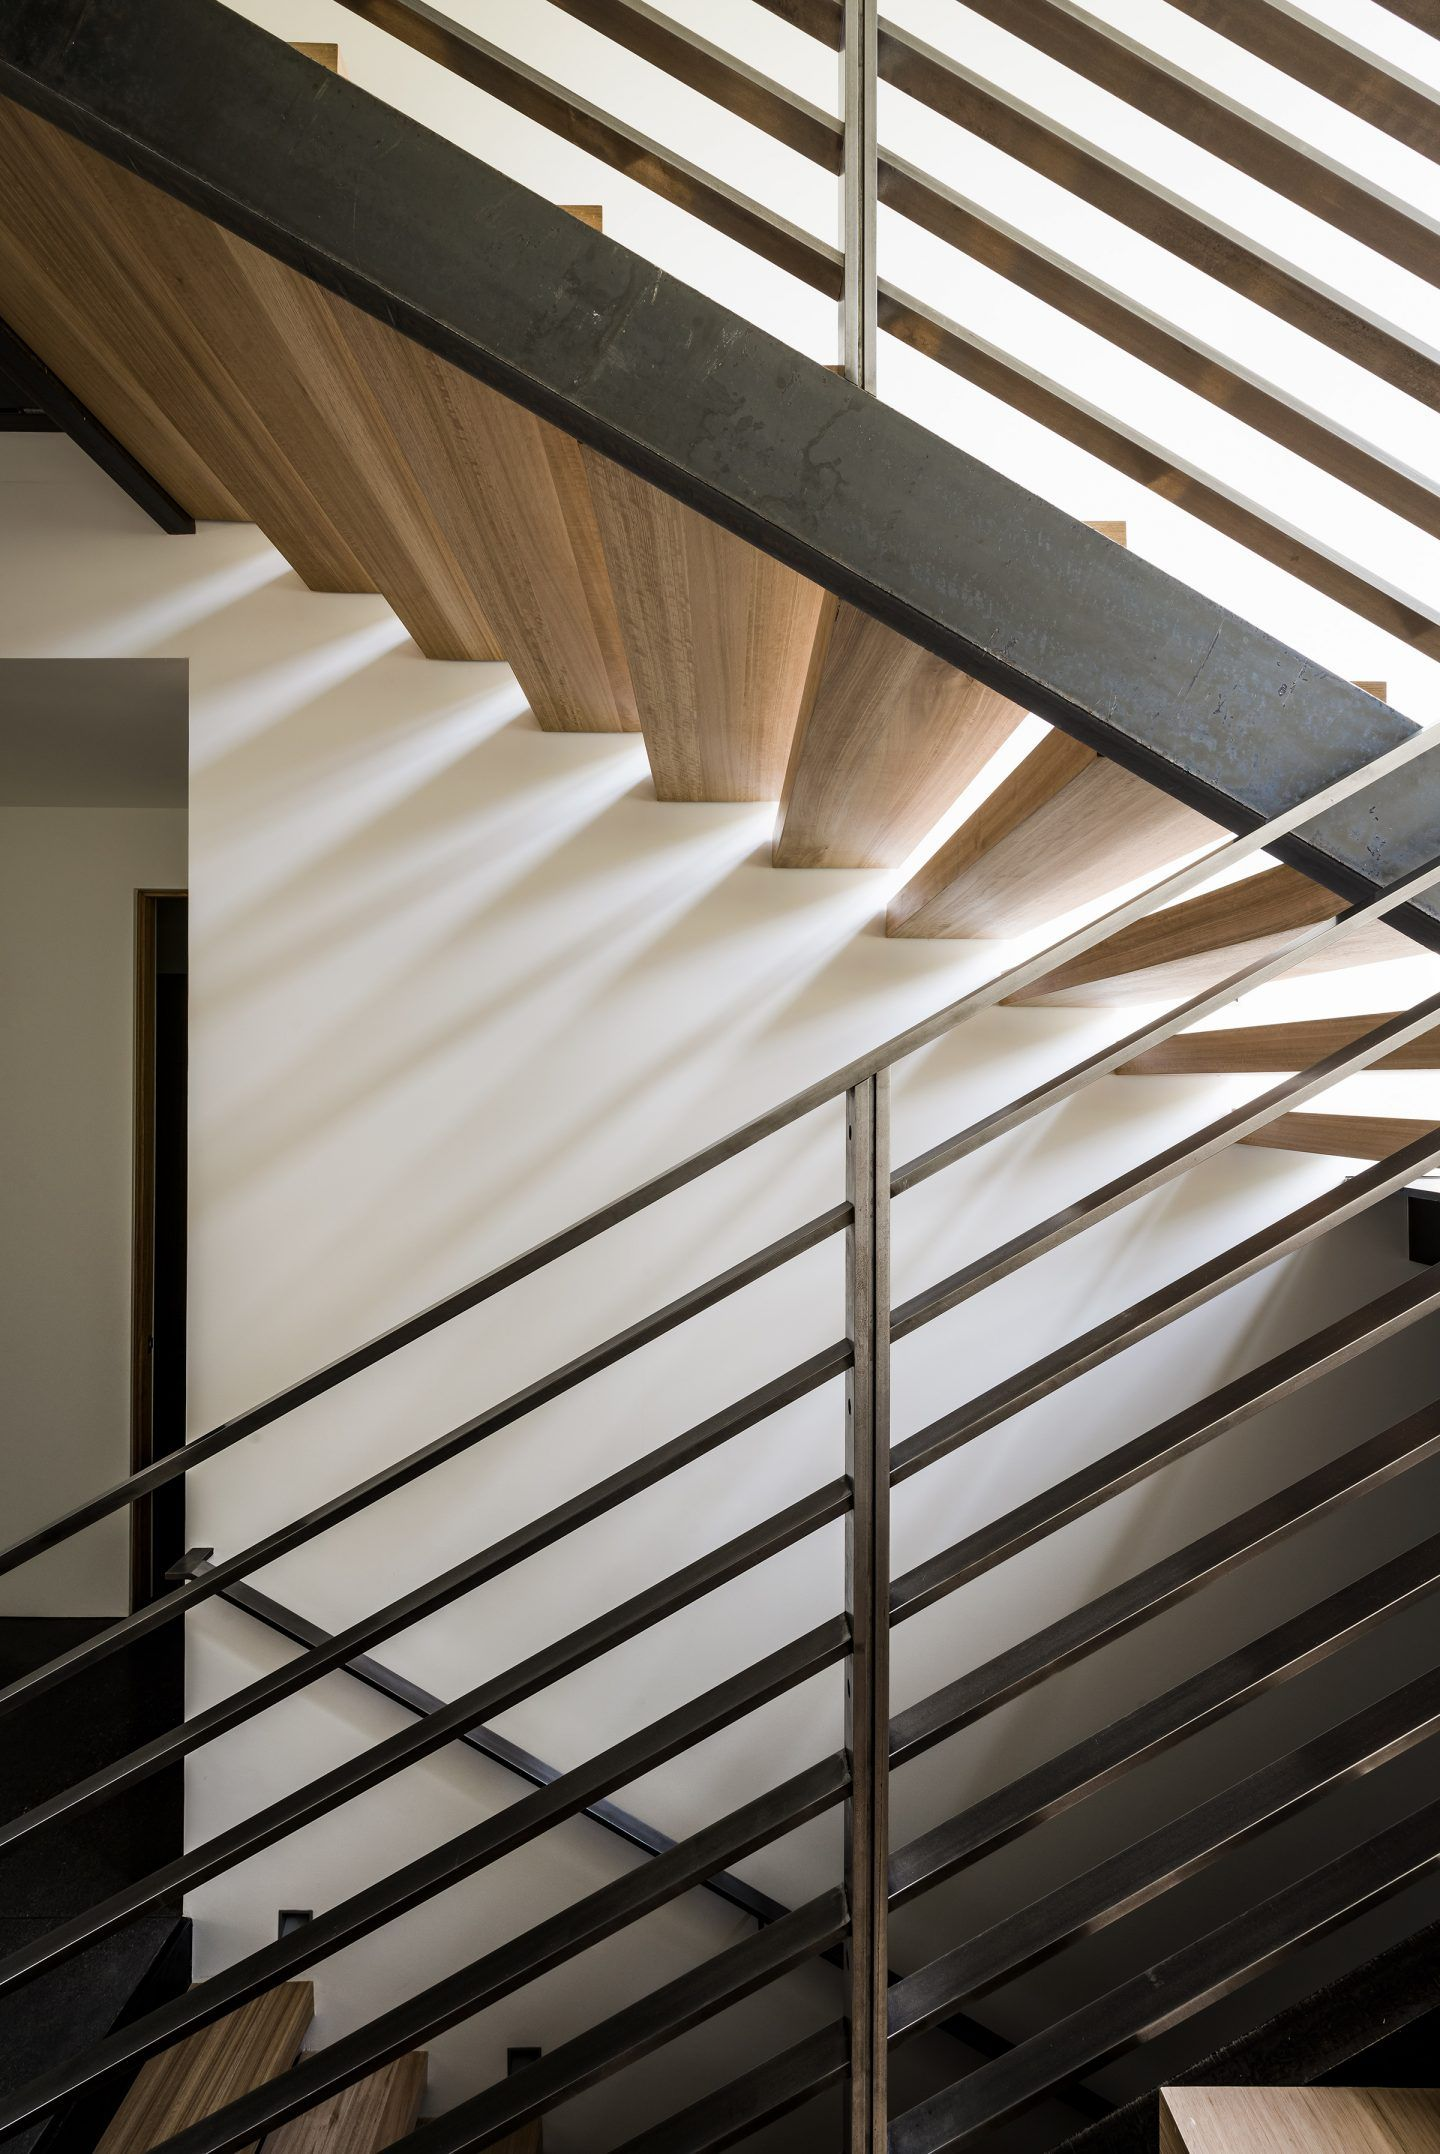 IGNANT-Architecture-Faulkner-Architects-Burnt-Cedar-05